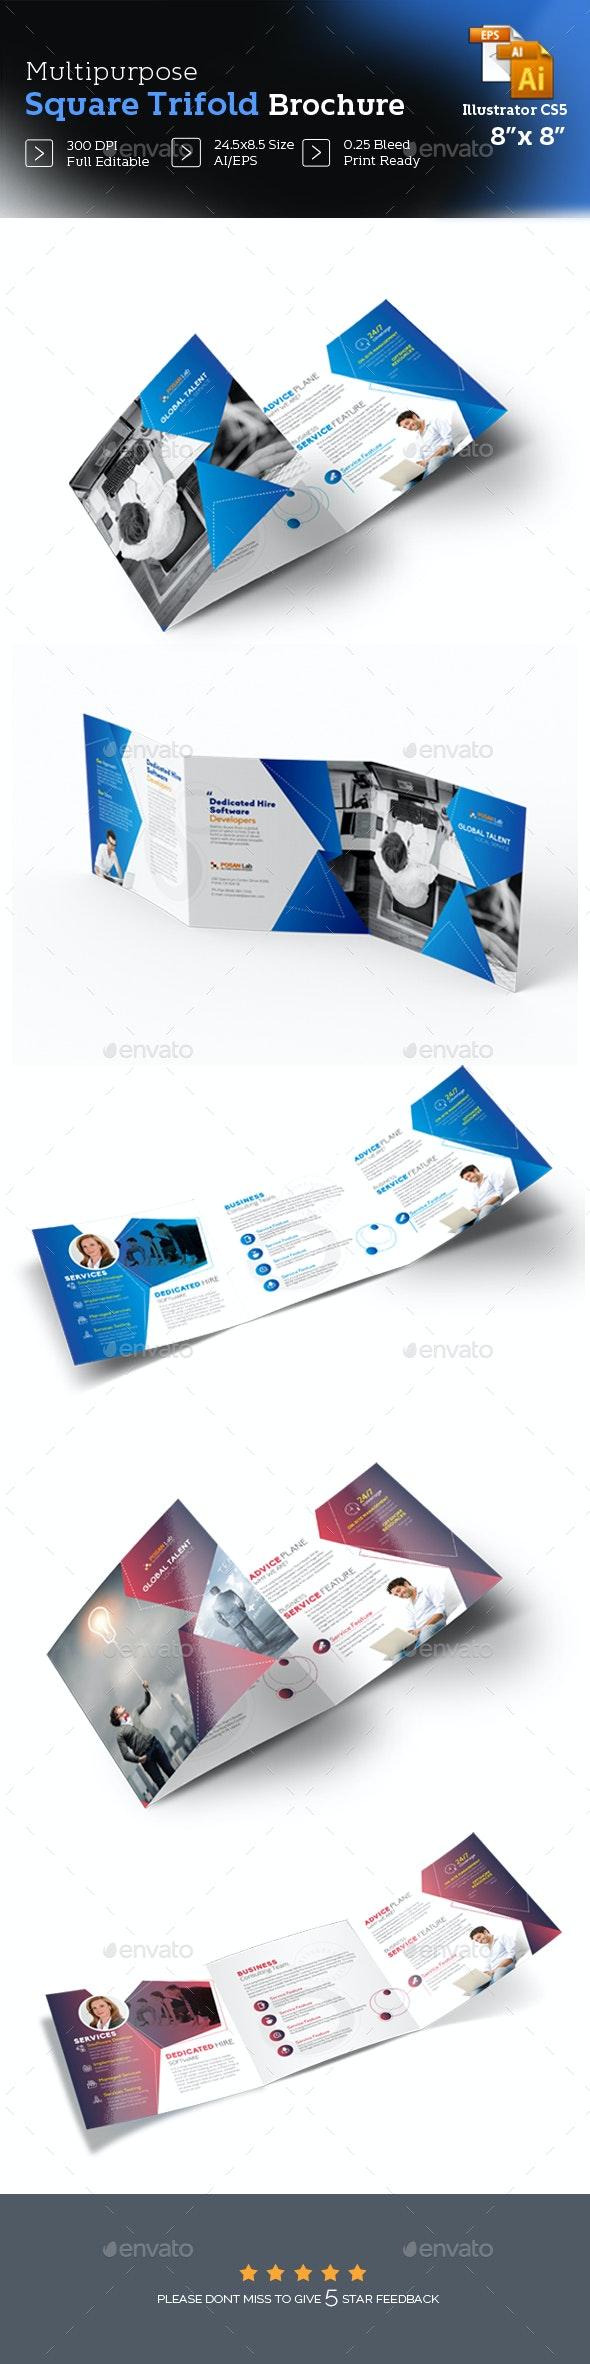 Business Trifold Brochure Design - Brochures Print Templates